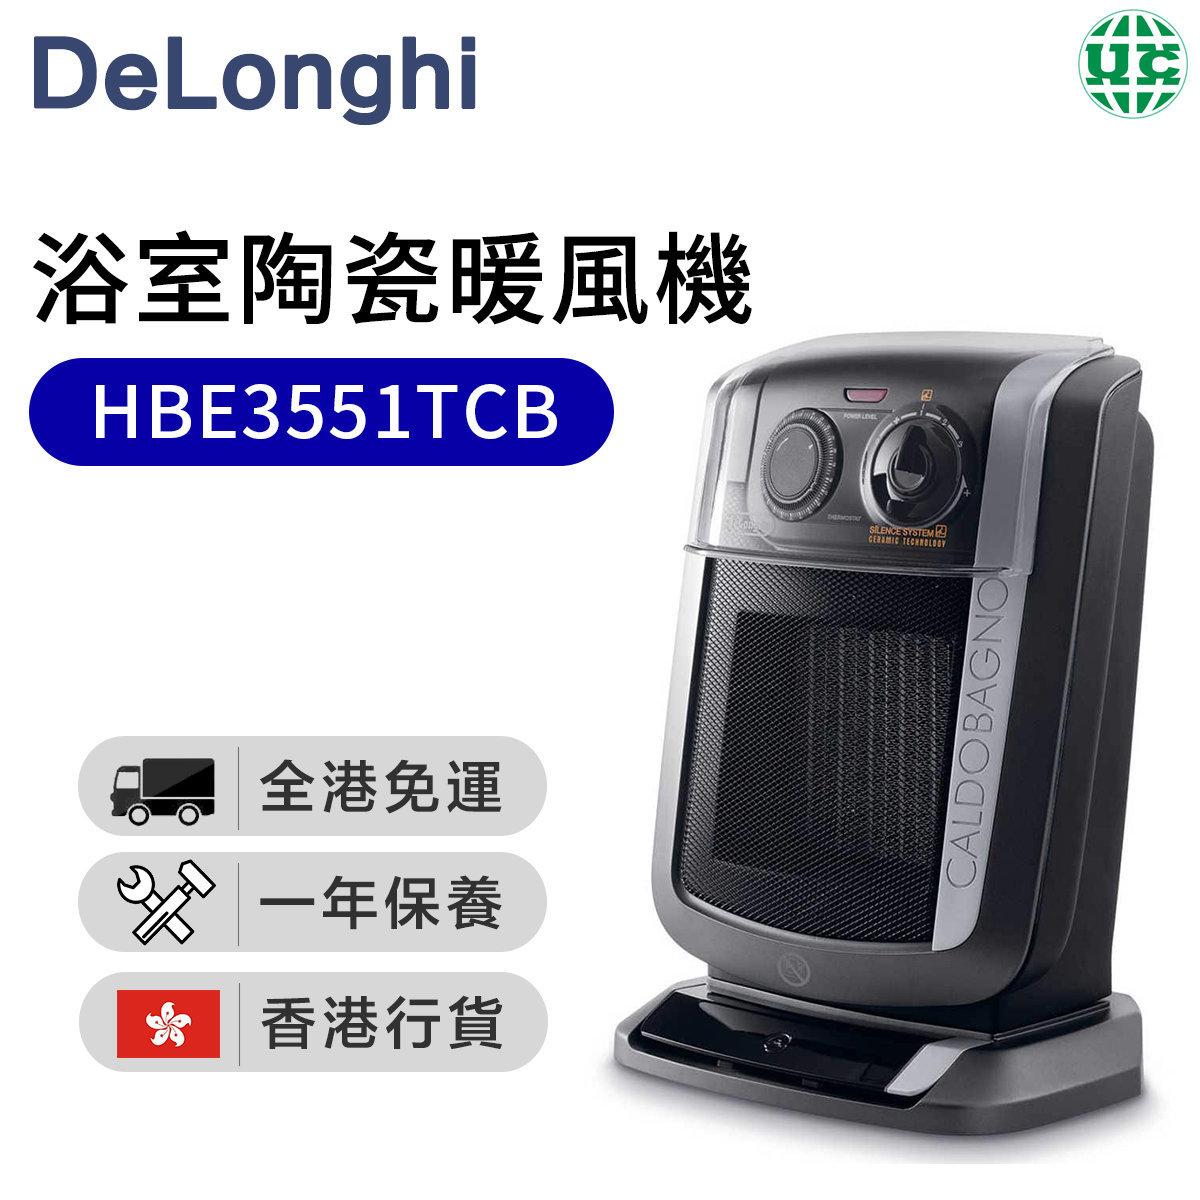 HBE3551TCB 浴室陶瓷暖風機  2200W 24小時時間掣 (香港行貨)